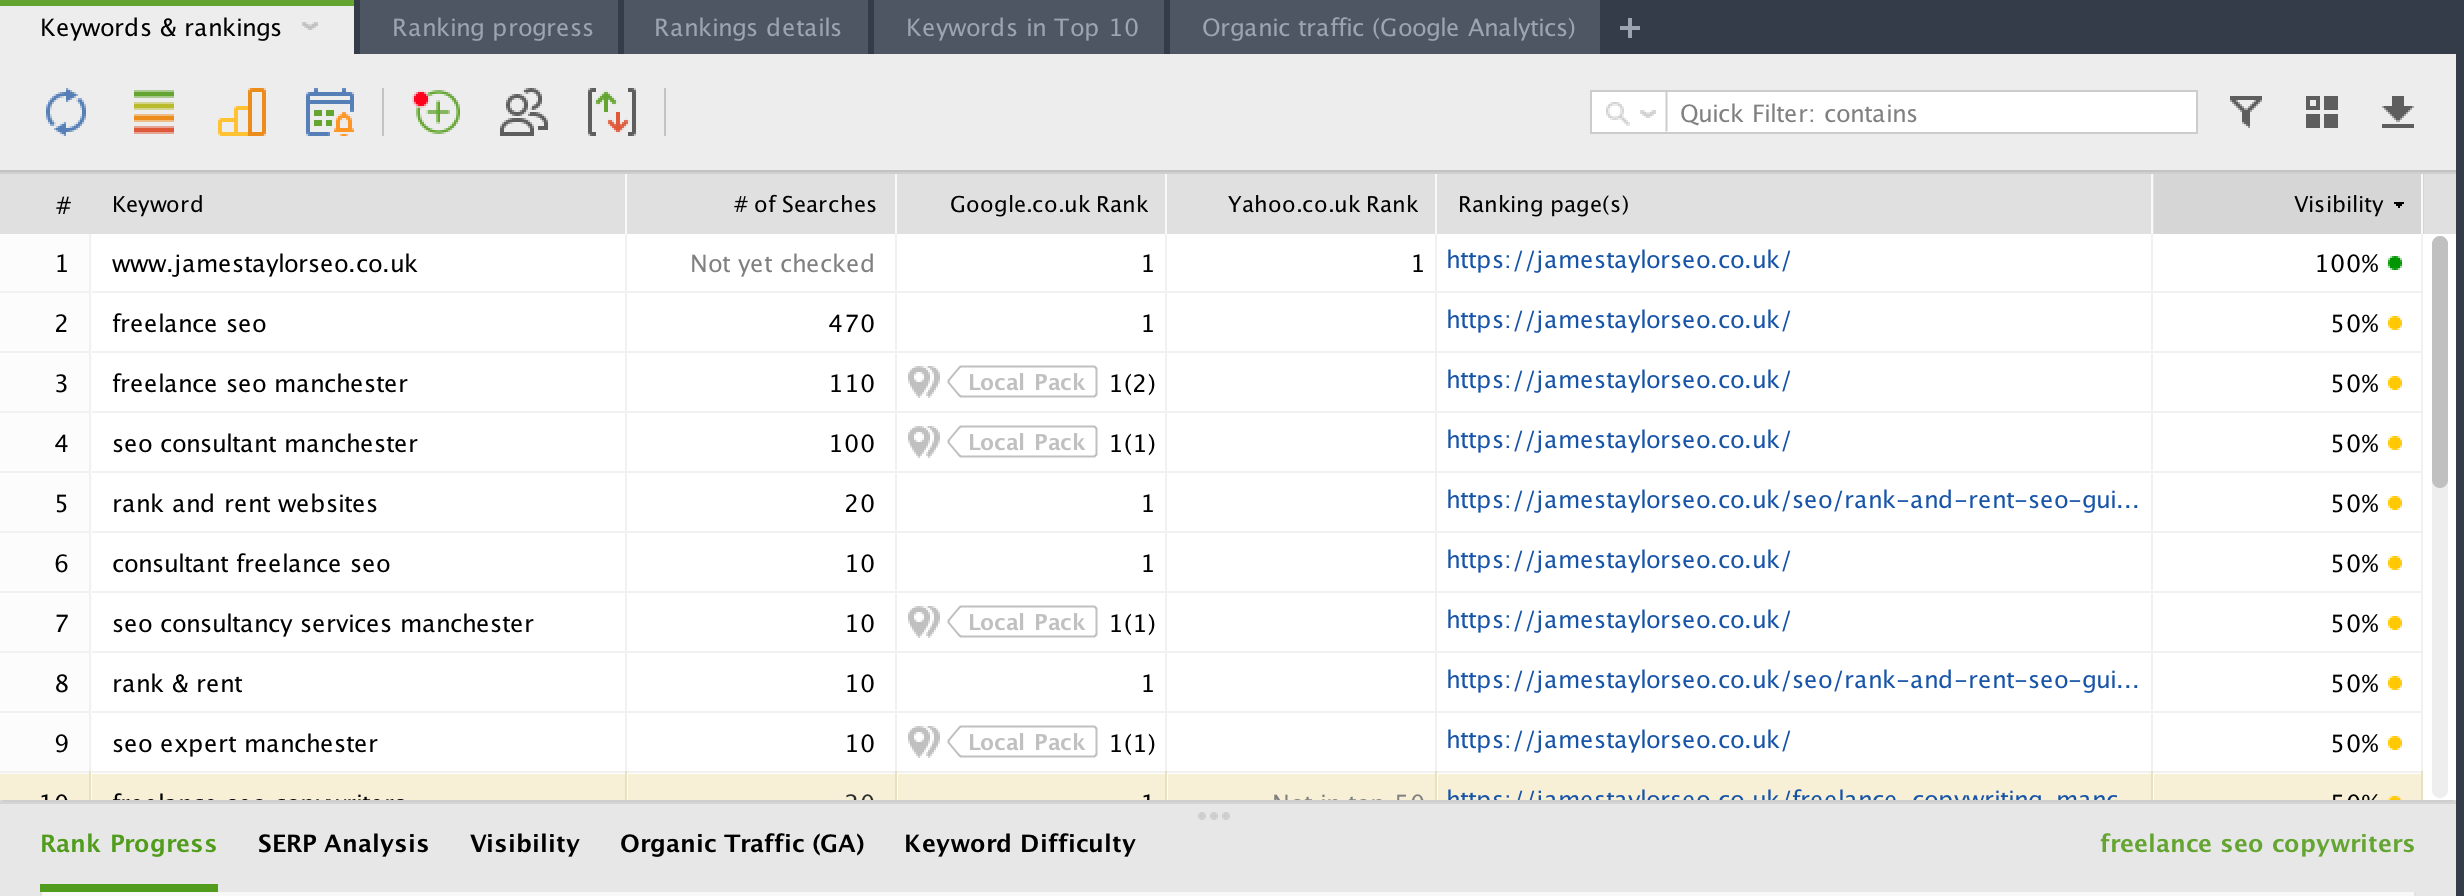 rank tracker image screenshot